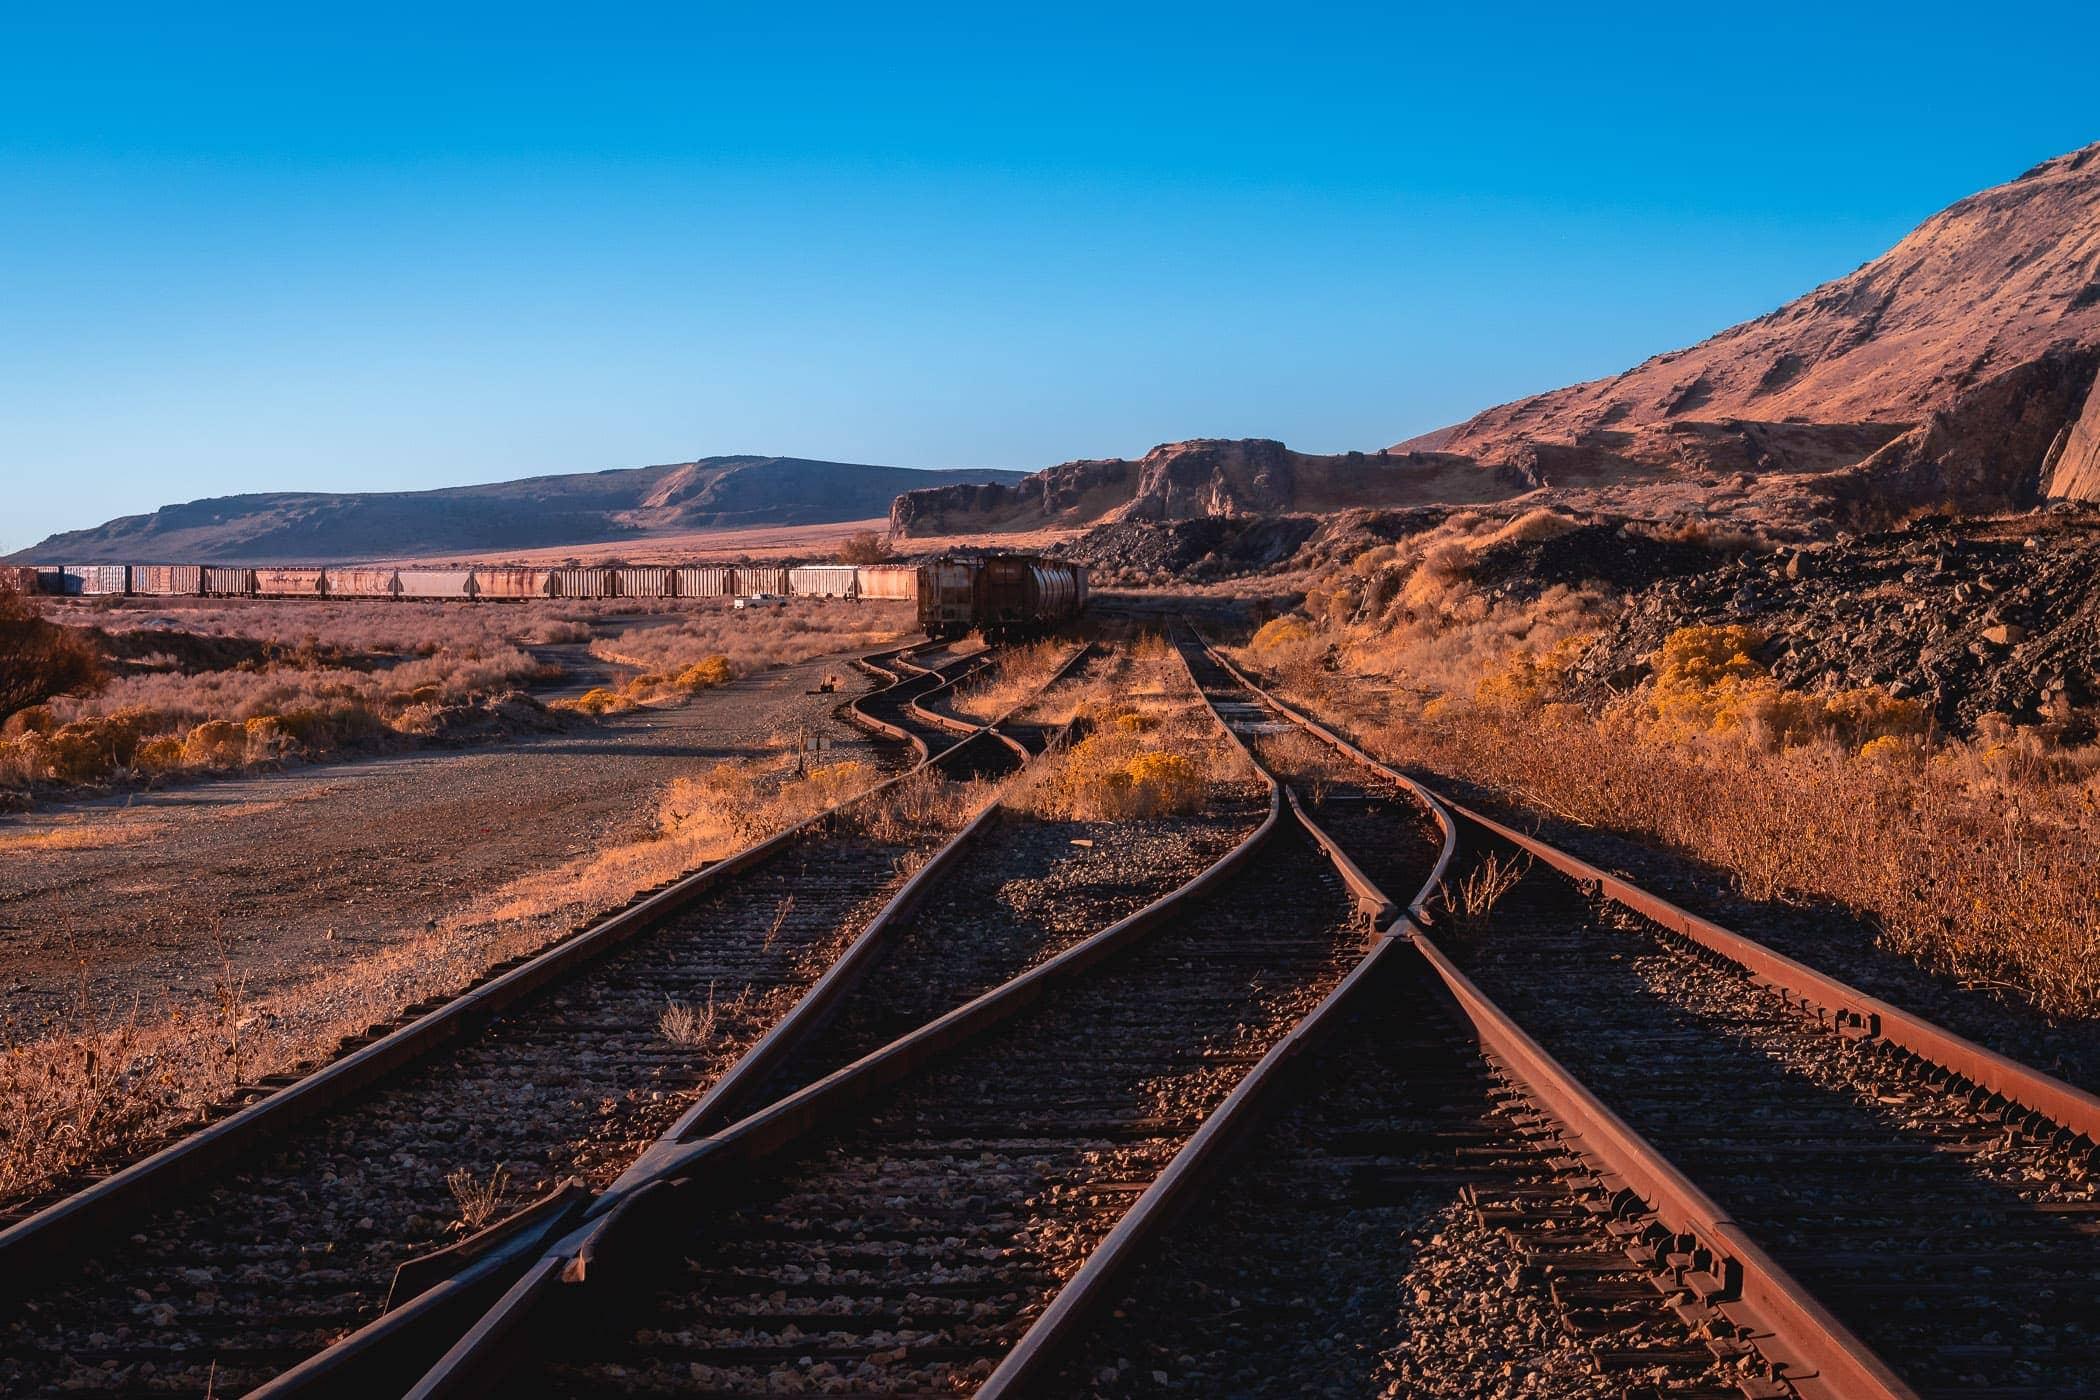 Railroad tracks intertwine in the desert near Grantsville, Utah.